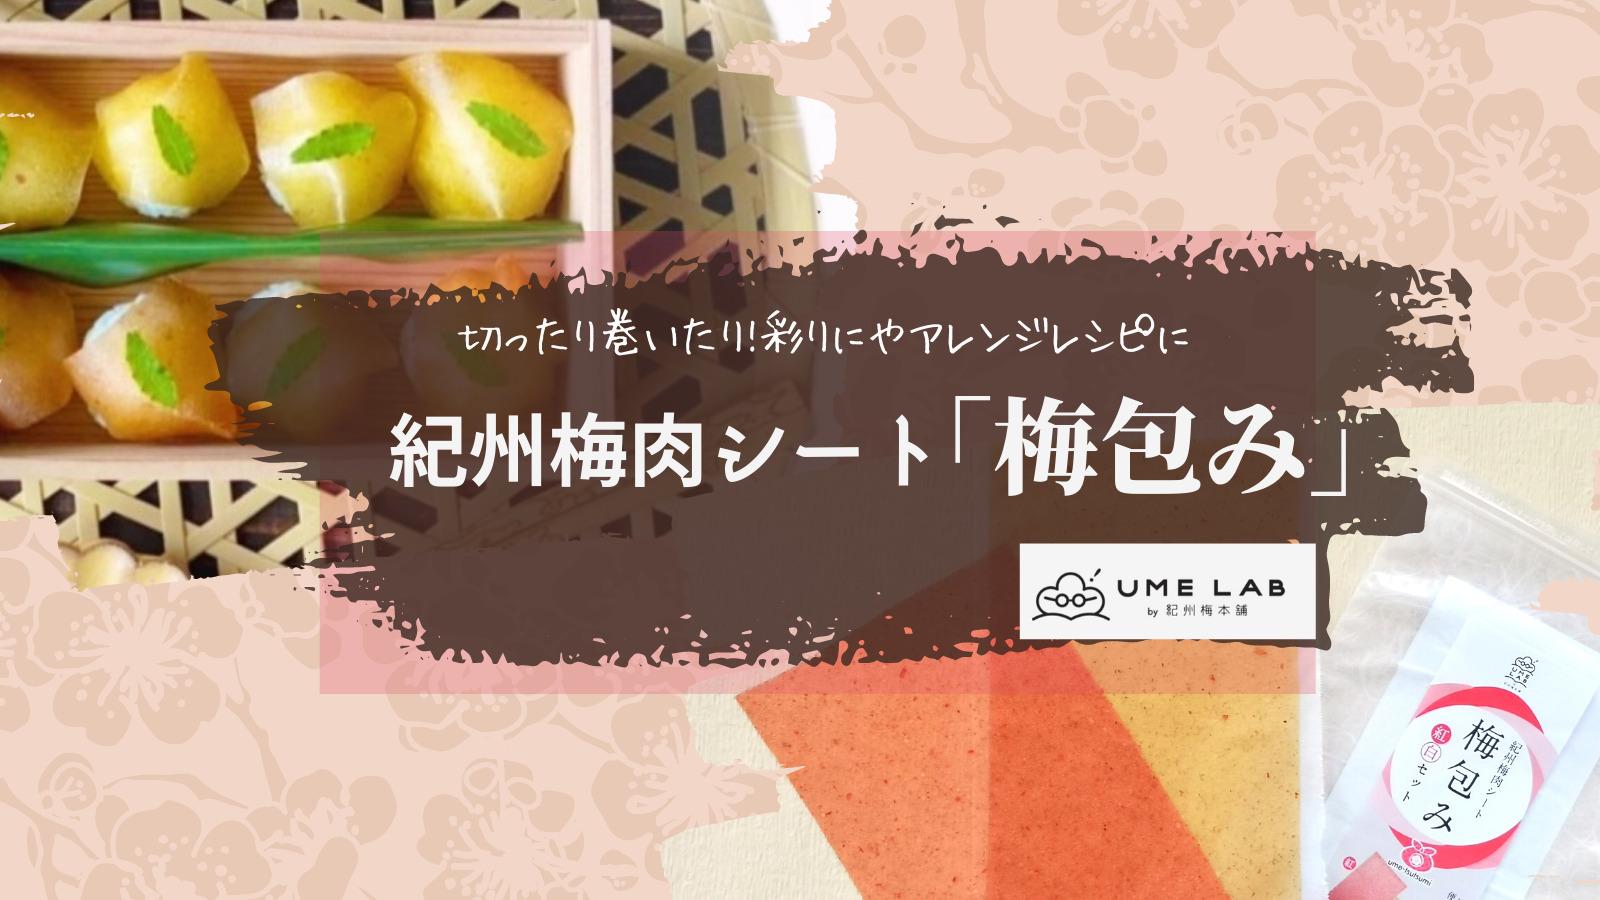 【UMELAB by 紀州梅本舗】梅肉シート「梅包み」 切ったり、巻いたり料理のアレンジ、彩りに